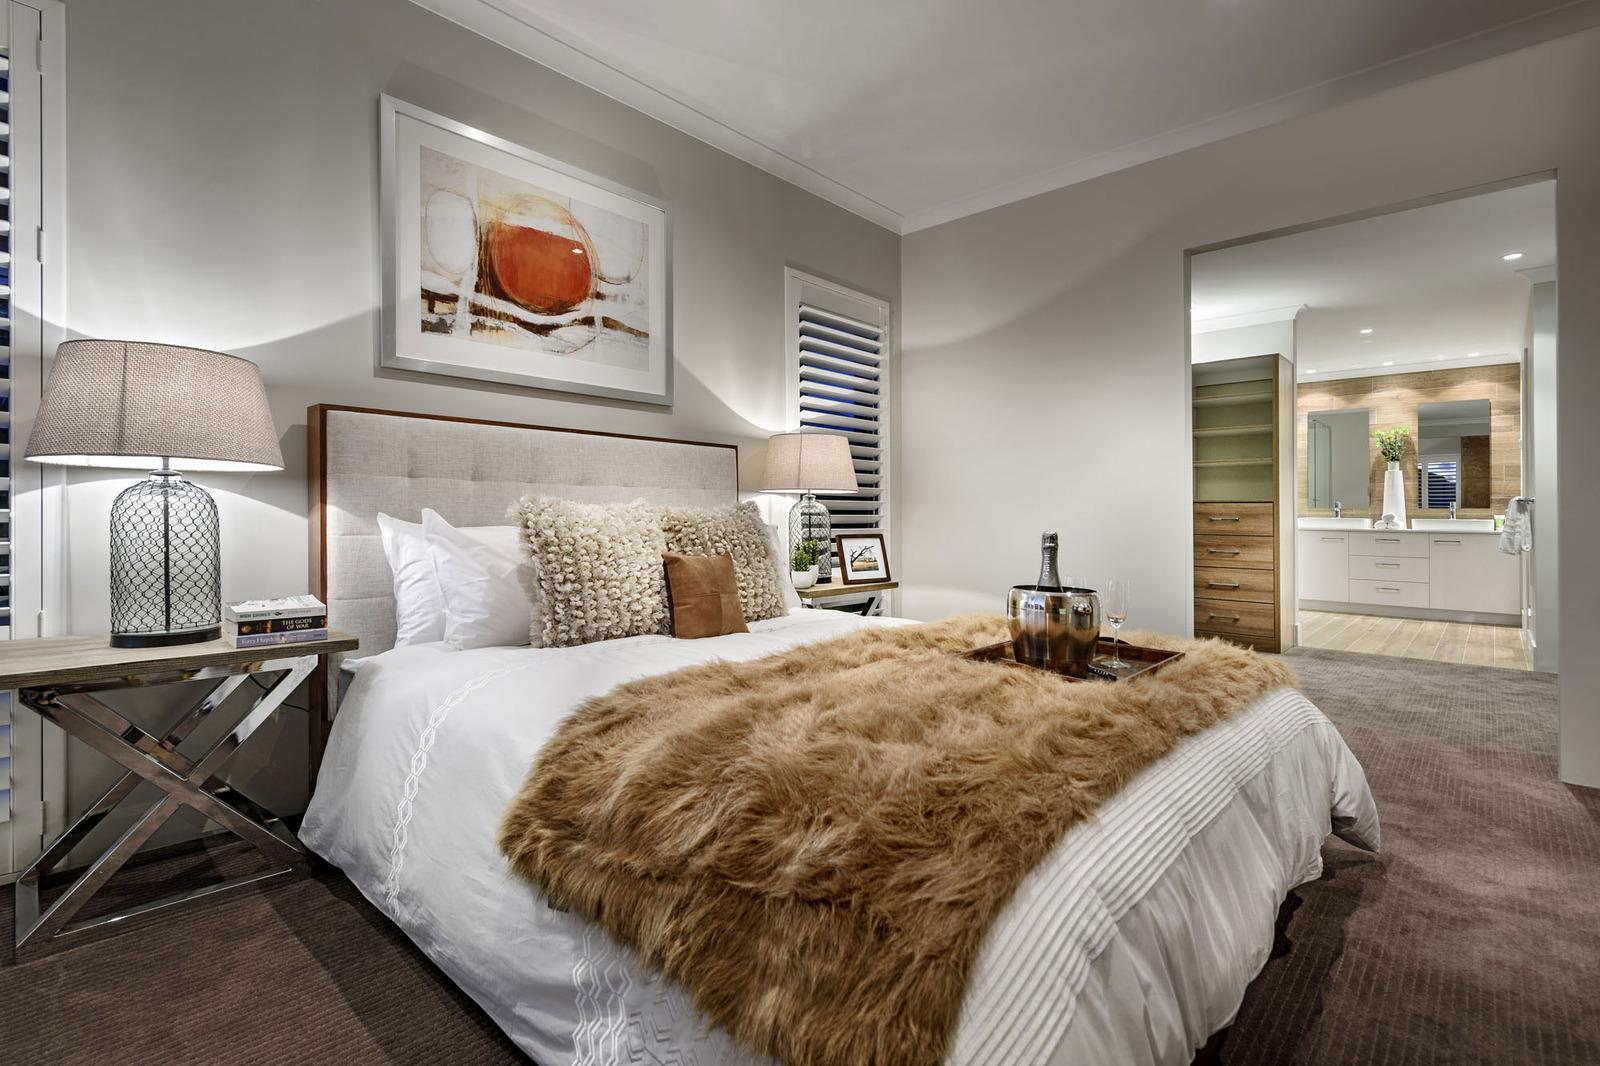 Super Cozy Elegant Home combines Craftsmanship with Rustic ...